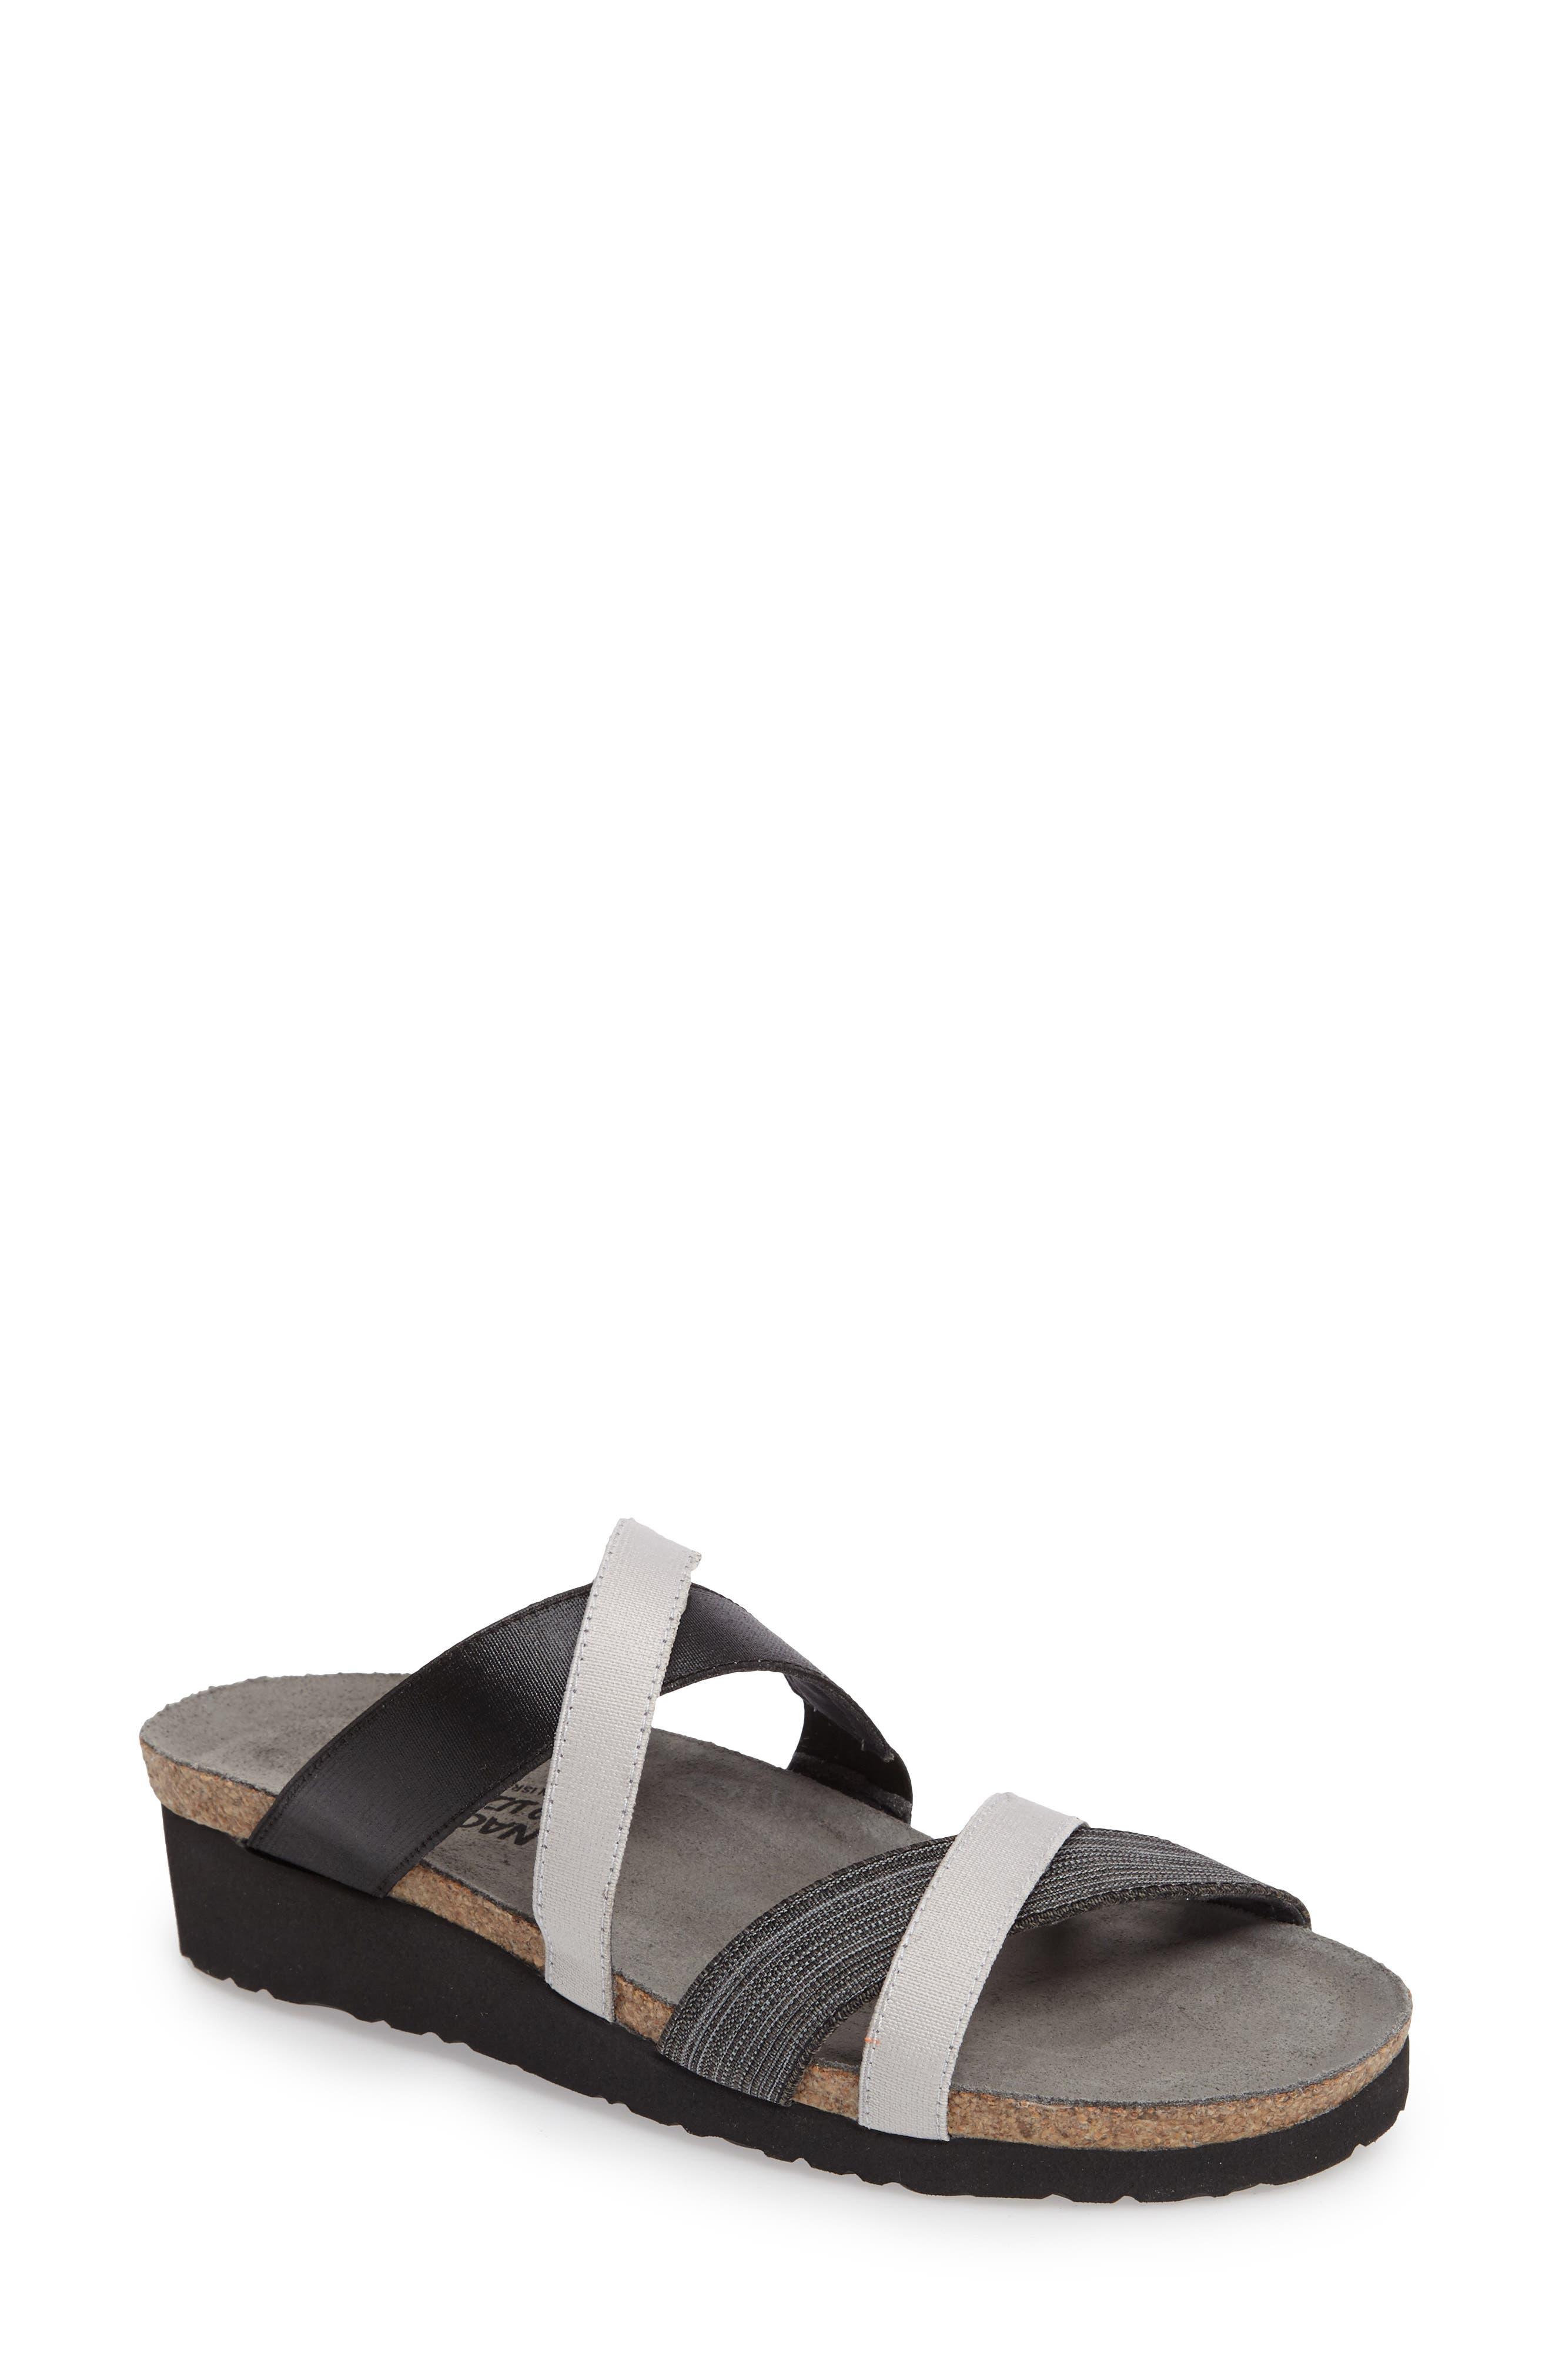 Roxana Strappy Slip-On Sandal,                             Main thumbnail 1, color,                             BLACK/ GREY FABRIC